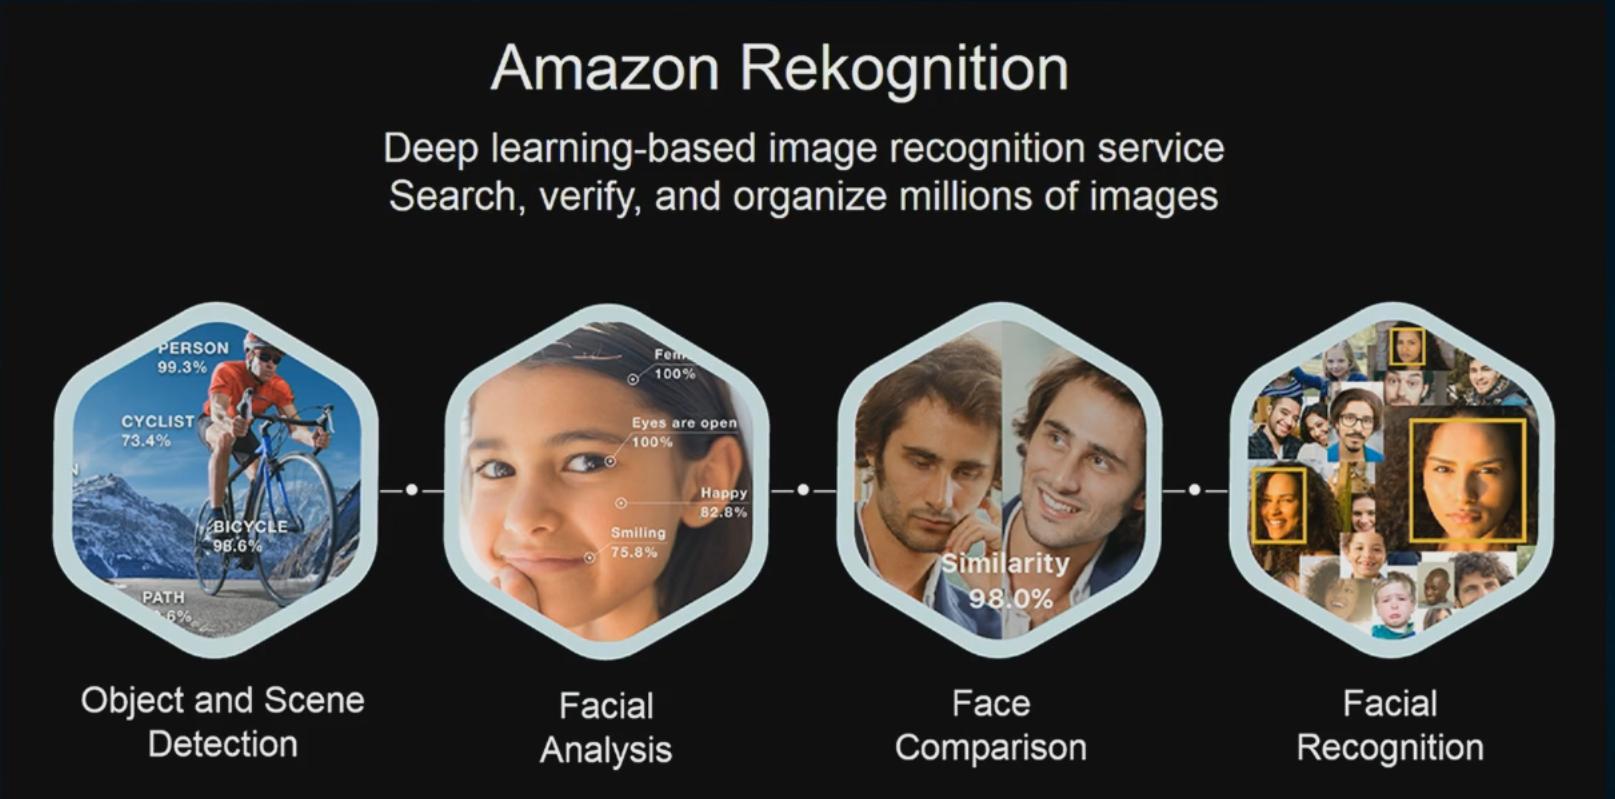 технология распознавания лиц Amazon